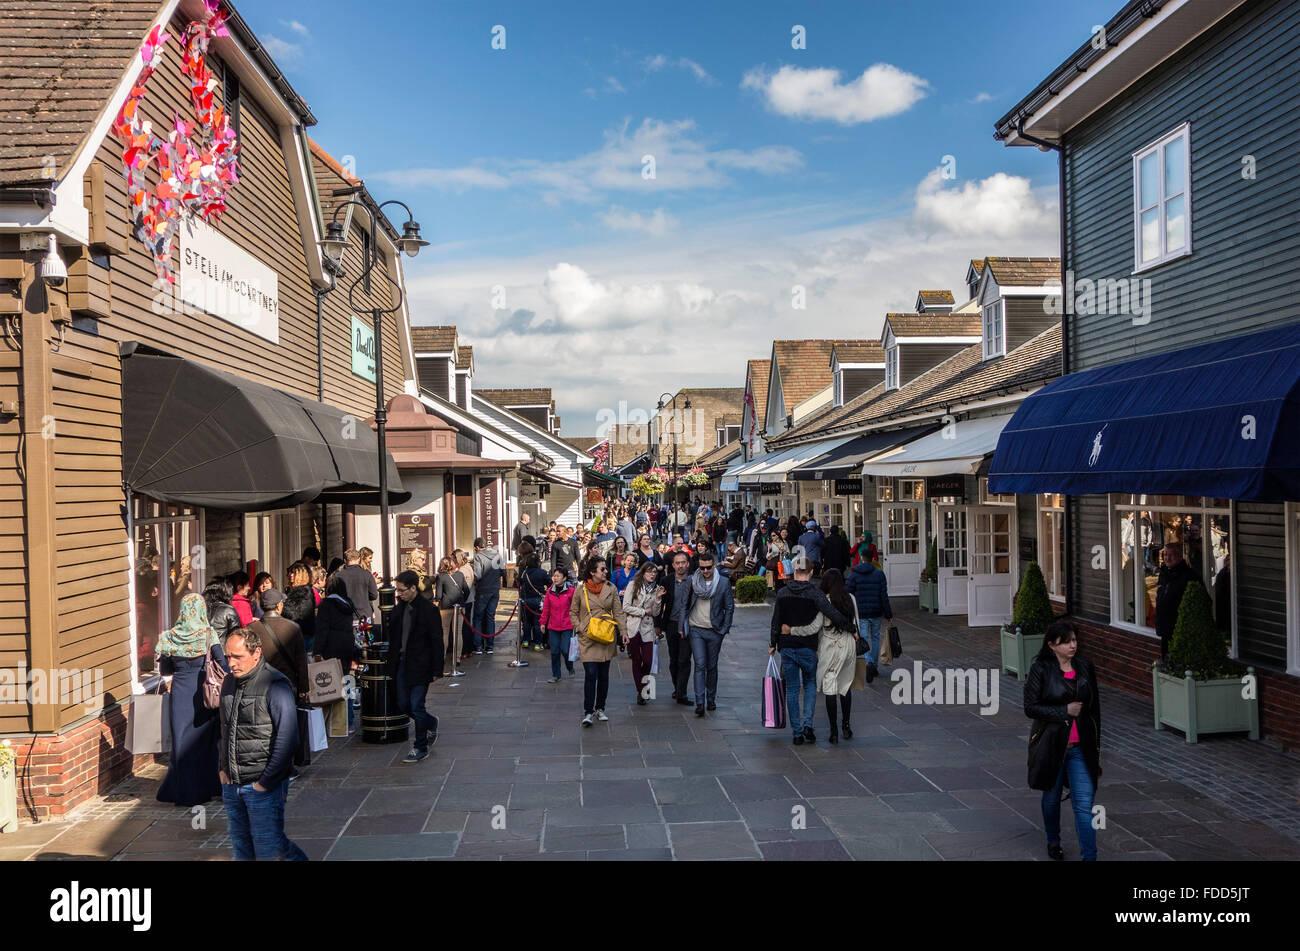 Bicester Village Outlet Shopping Centre near Oxford Oxfordshire England UK  Europe 102537fde0af5